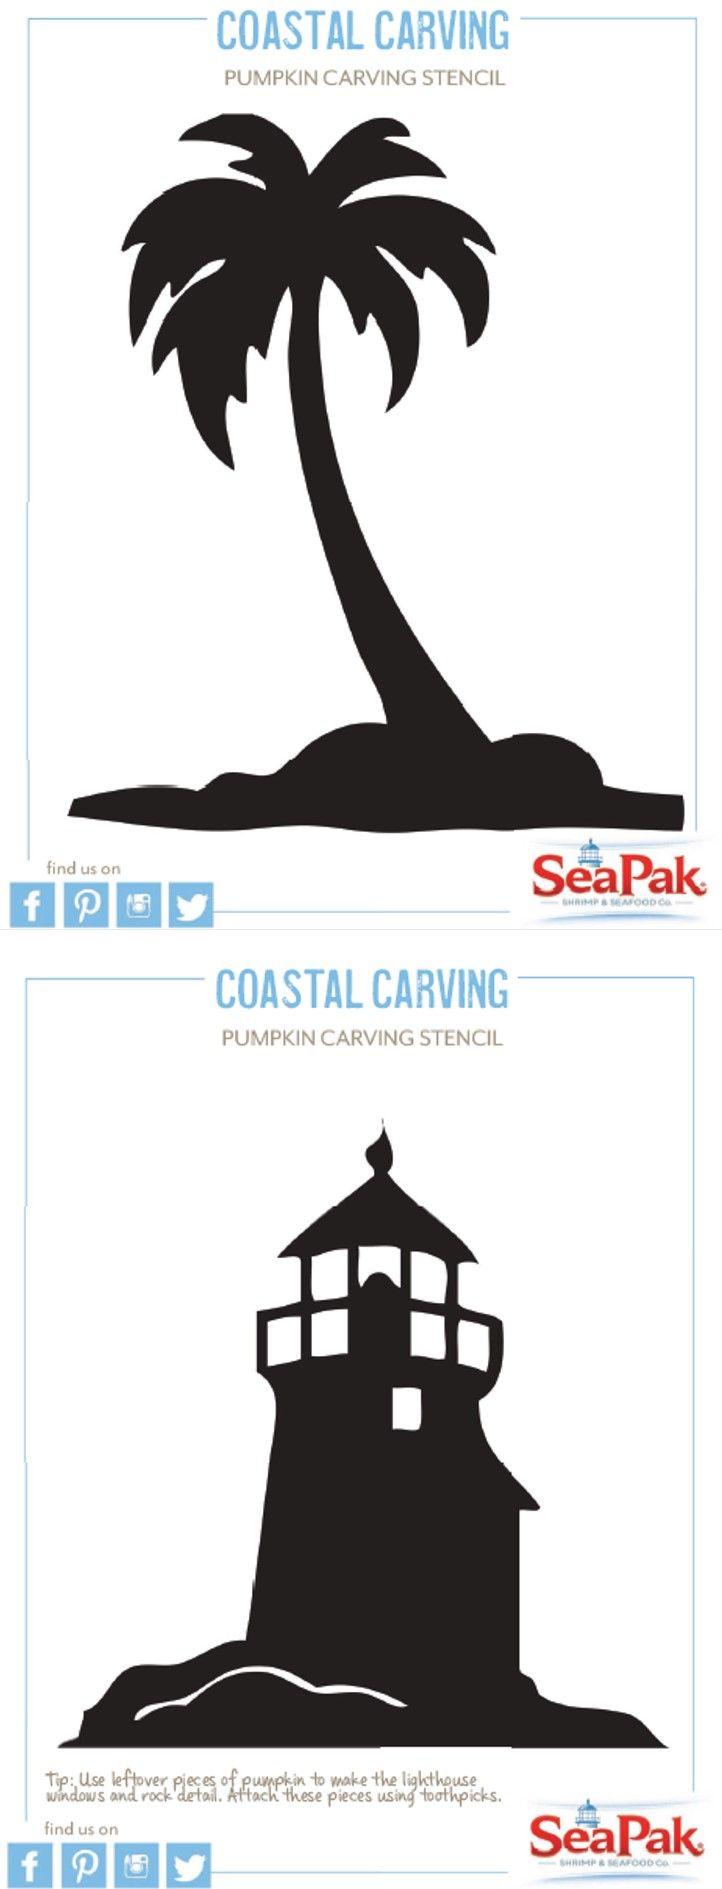 #printable stencils for the perfect, coastal jack-o-lantern #halloween #kids